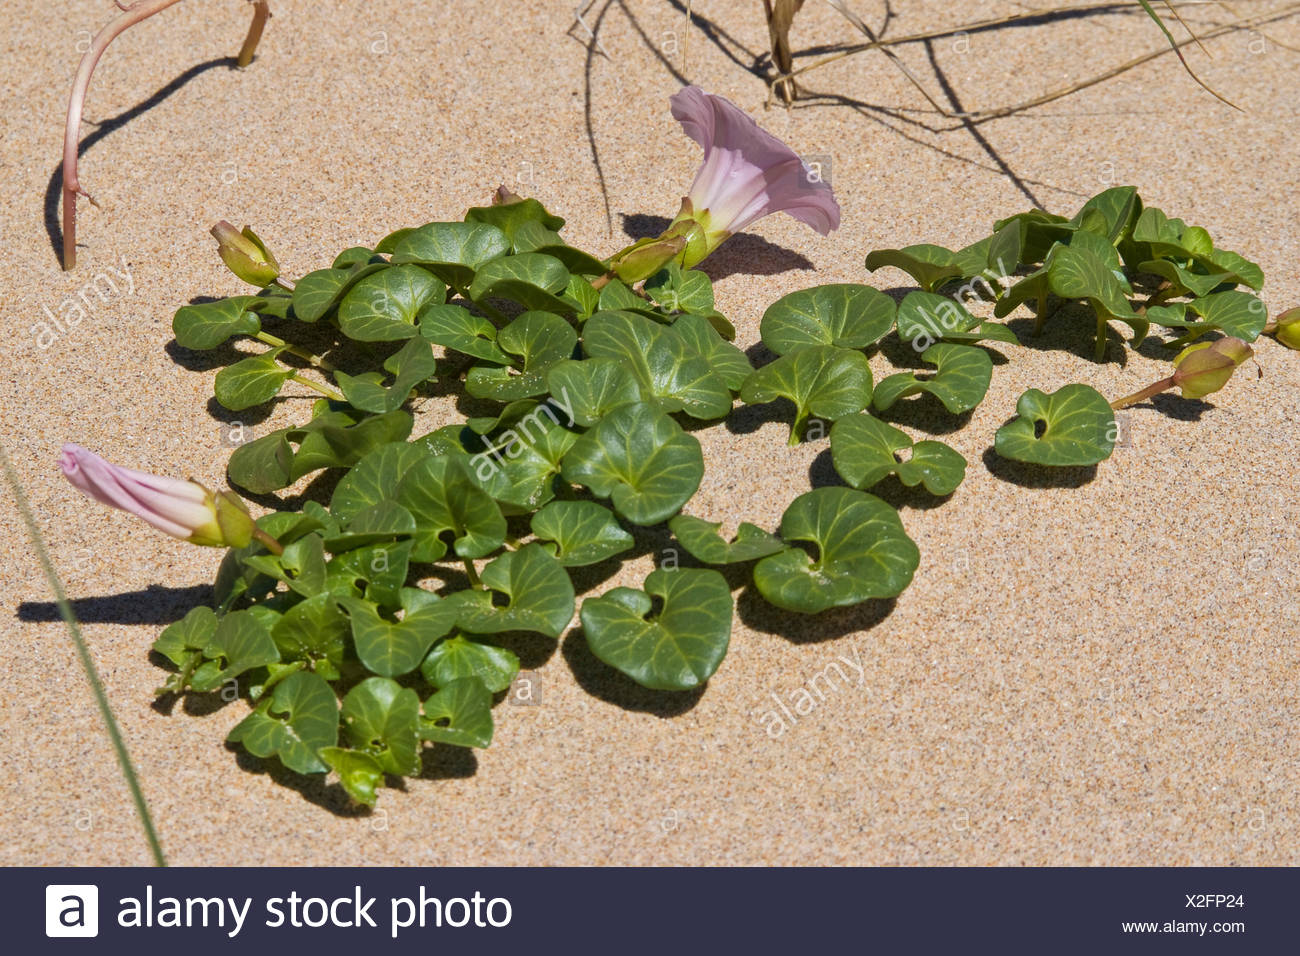 Beach morning-glory, Sea bindweed, Seashore false bindweed, Seashore morning-glory (Calystegia soldanella), blooming on the beach, Netherlands - Stock Image